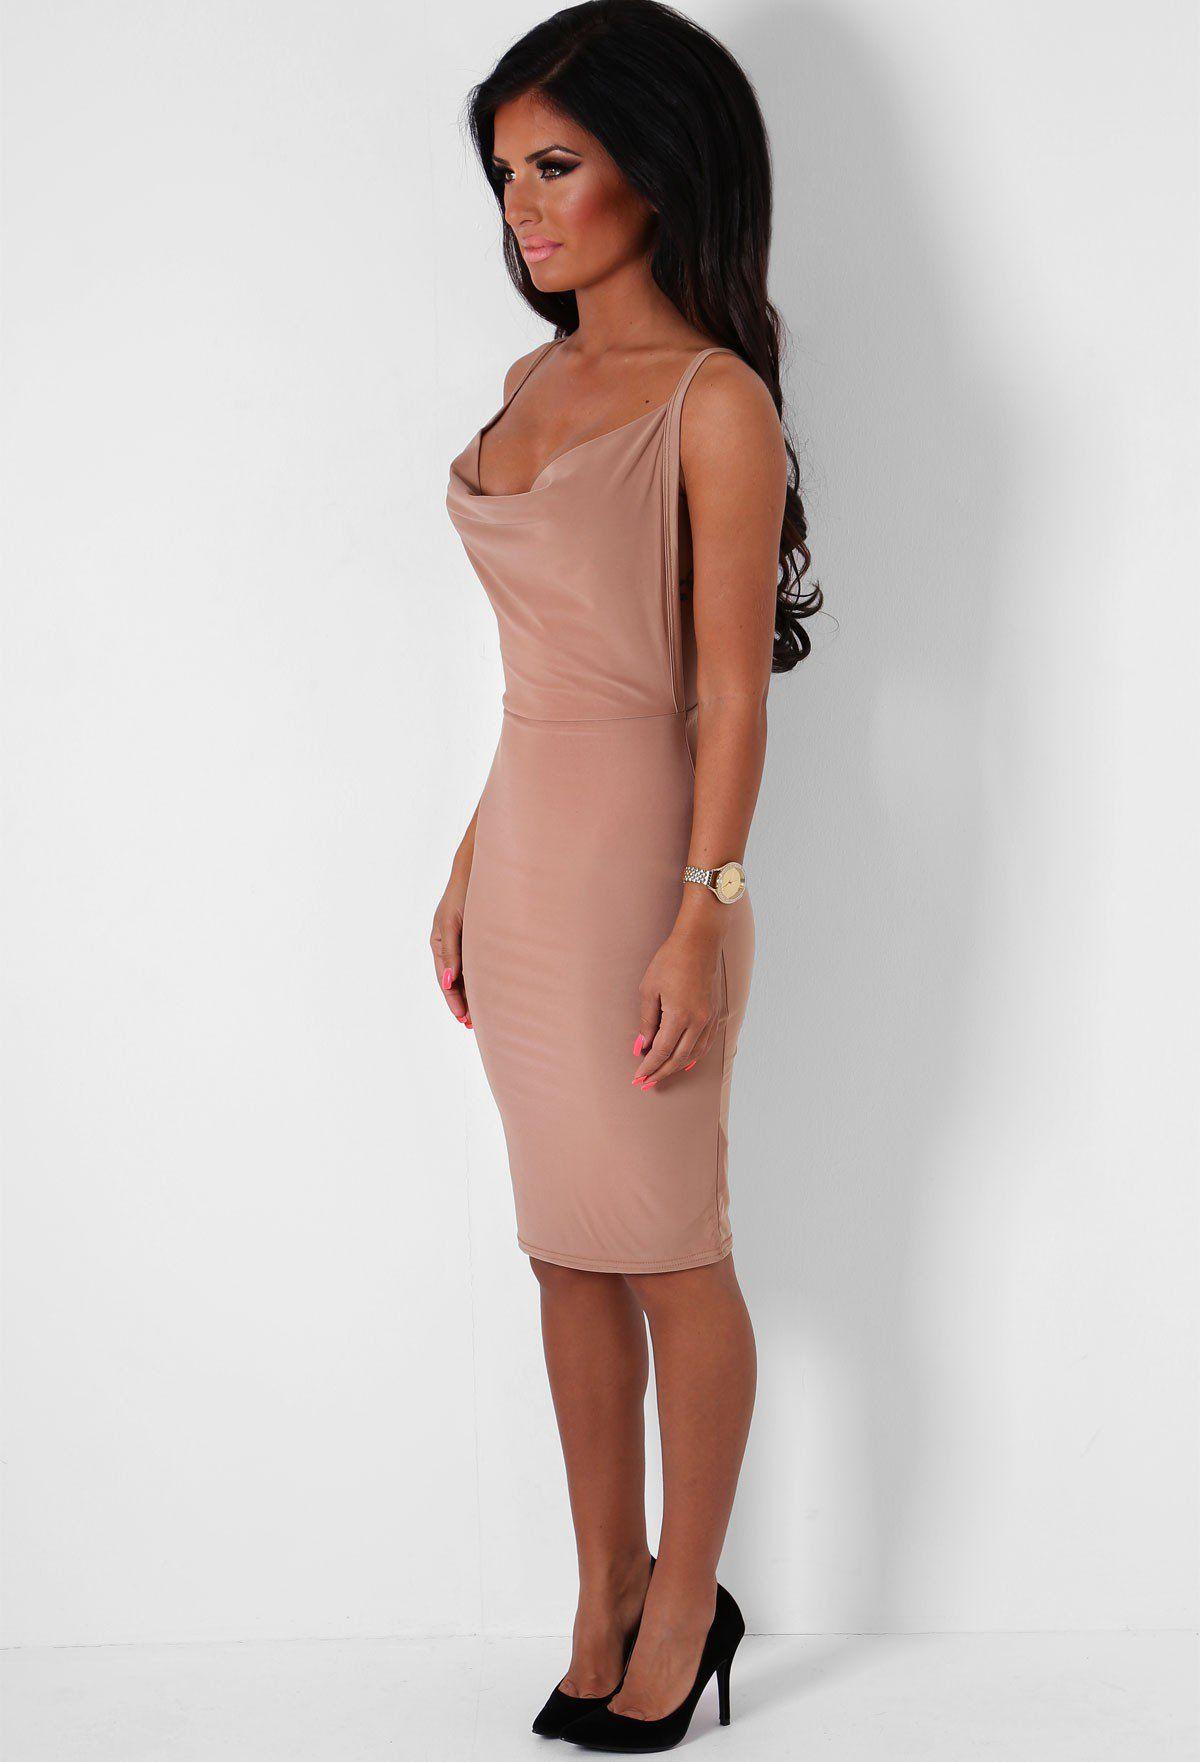 Nadia mocha backless dress dresses pinterest inspire clothing